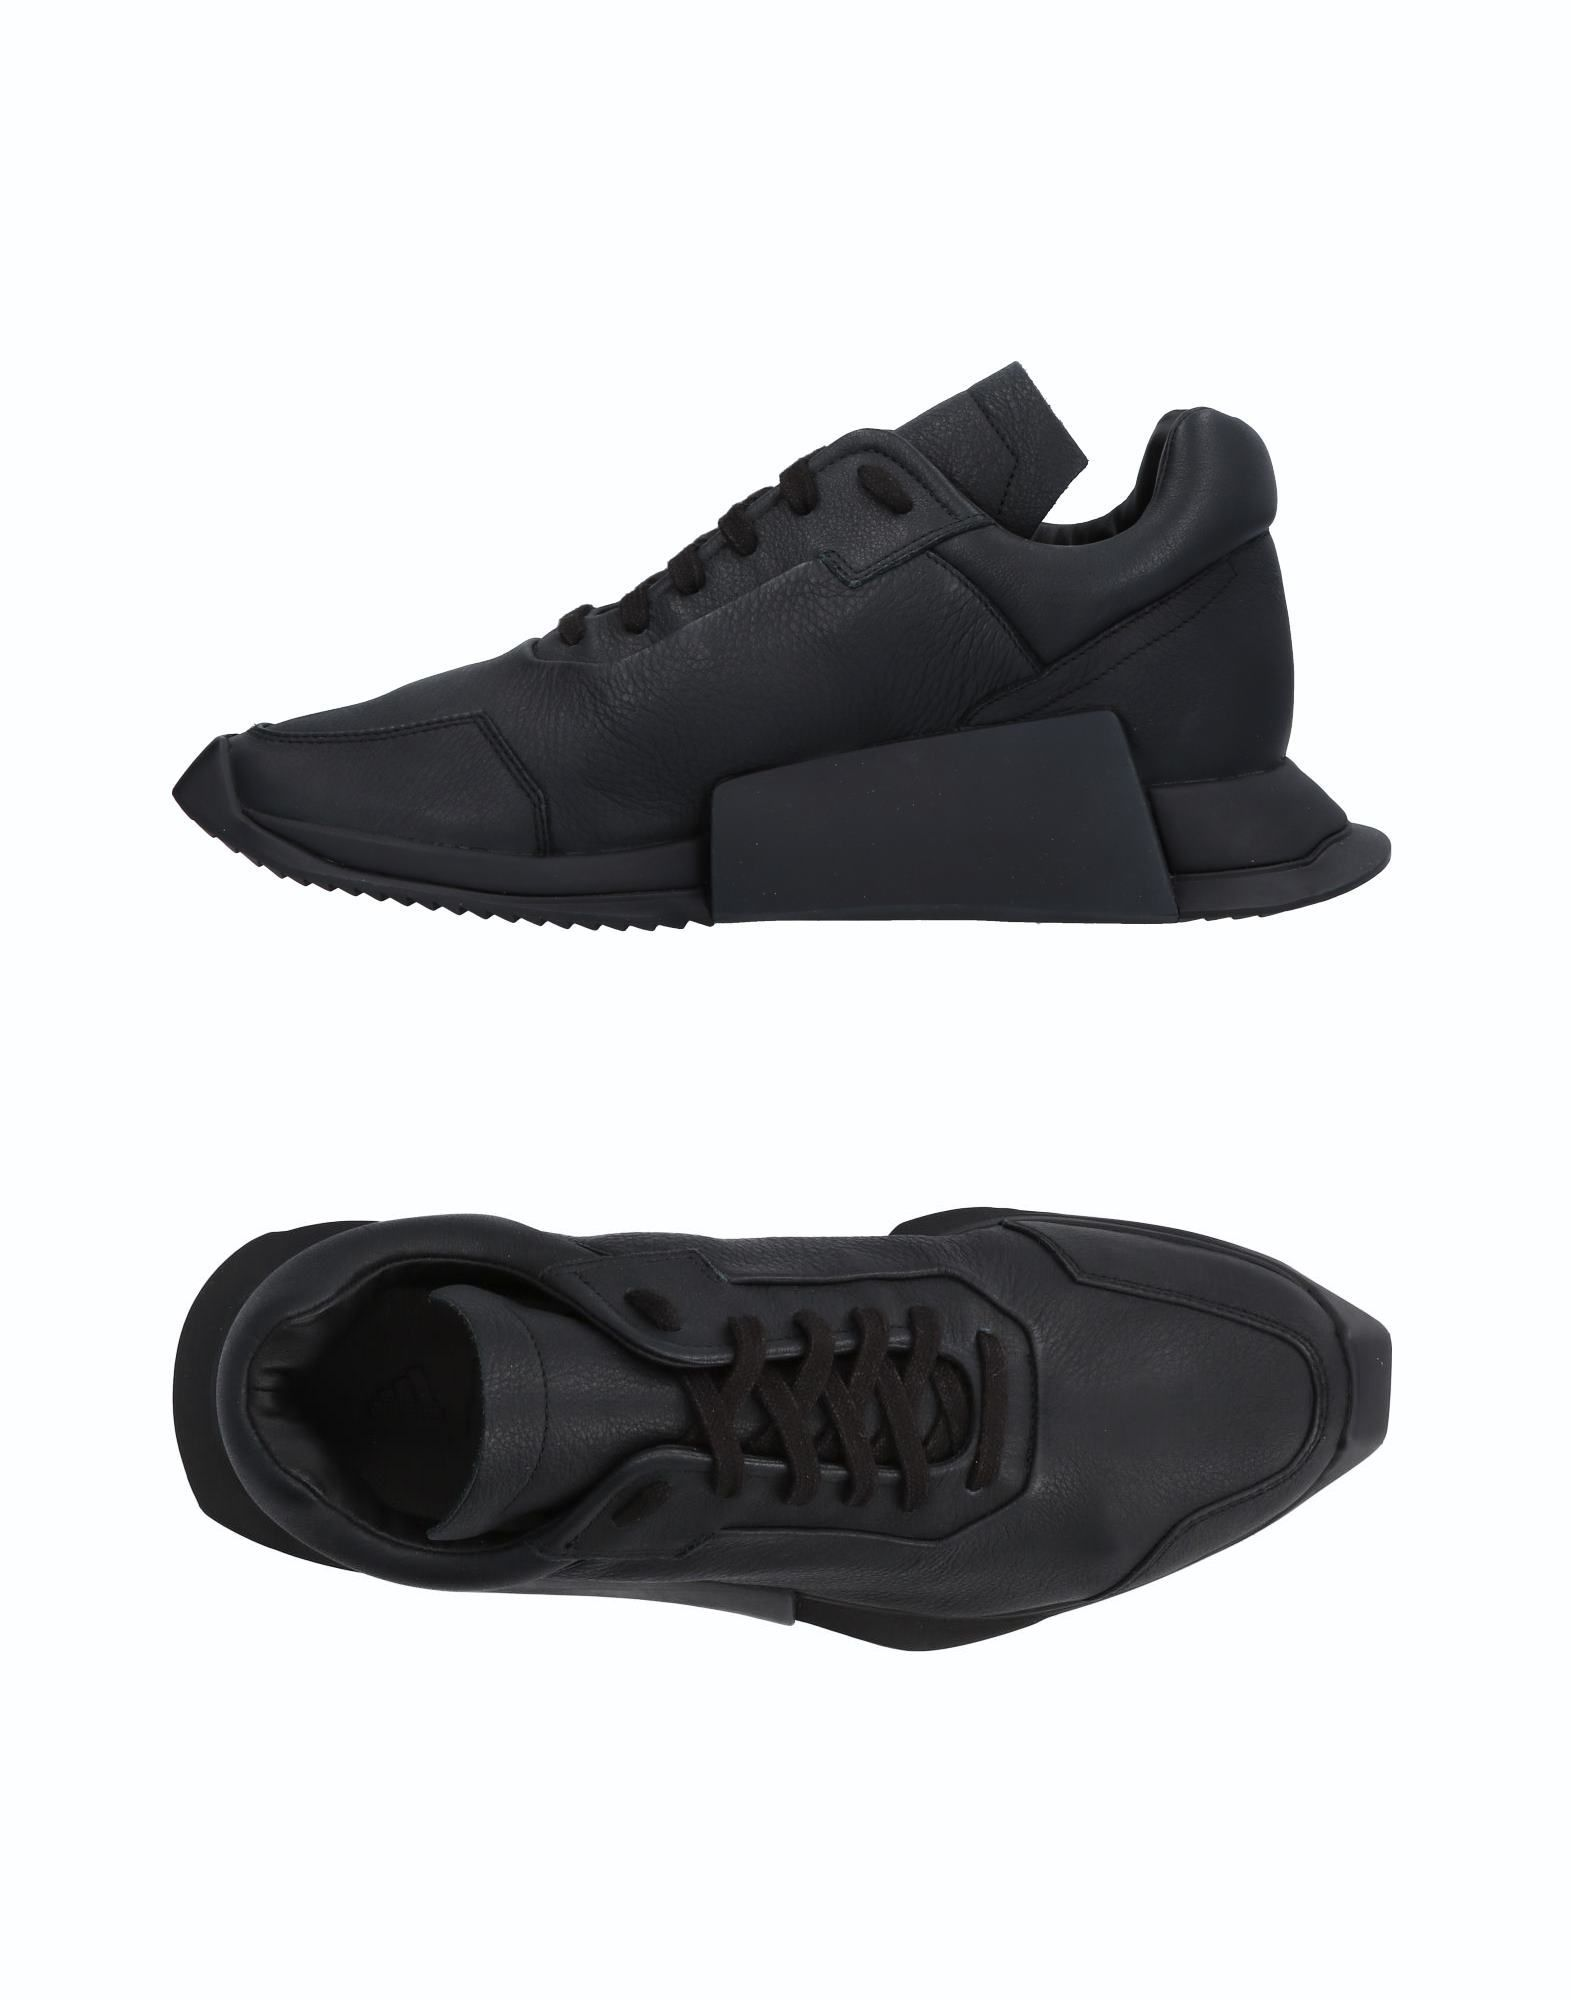 Sneakers Rick Owens X Adidas Donna - Acquista online su